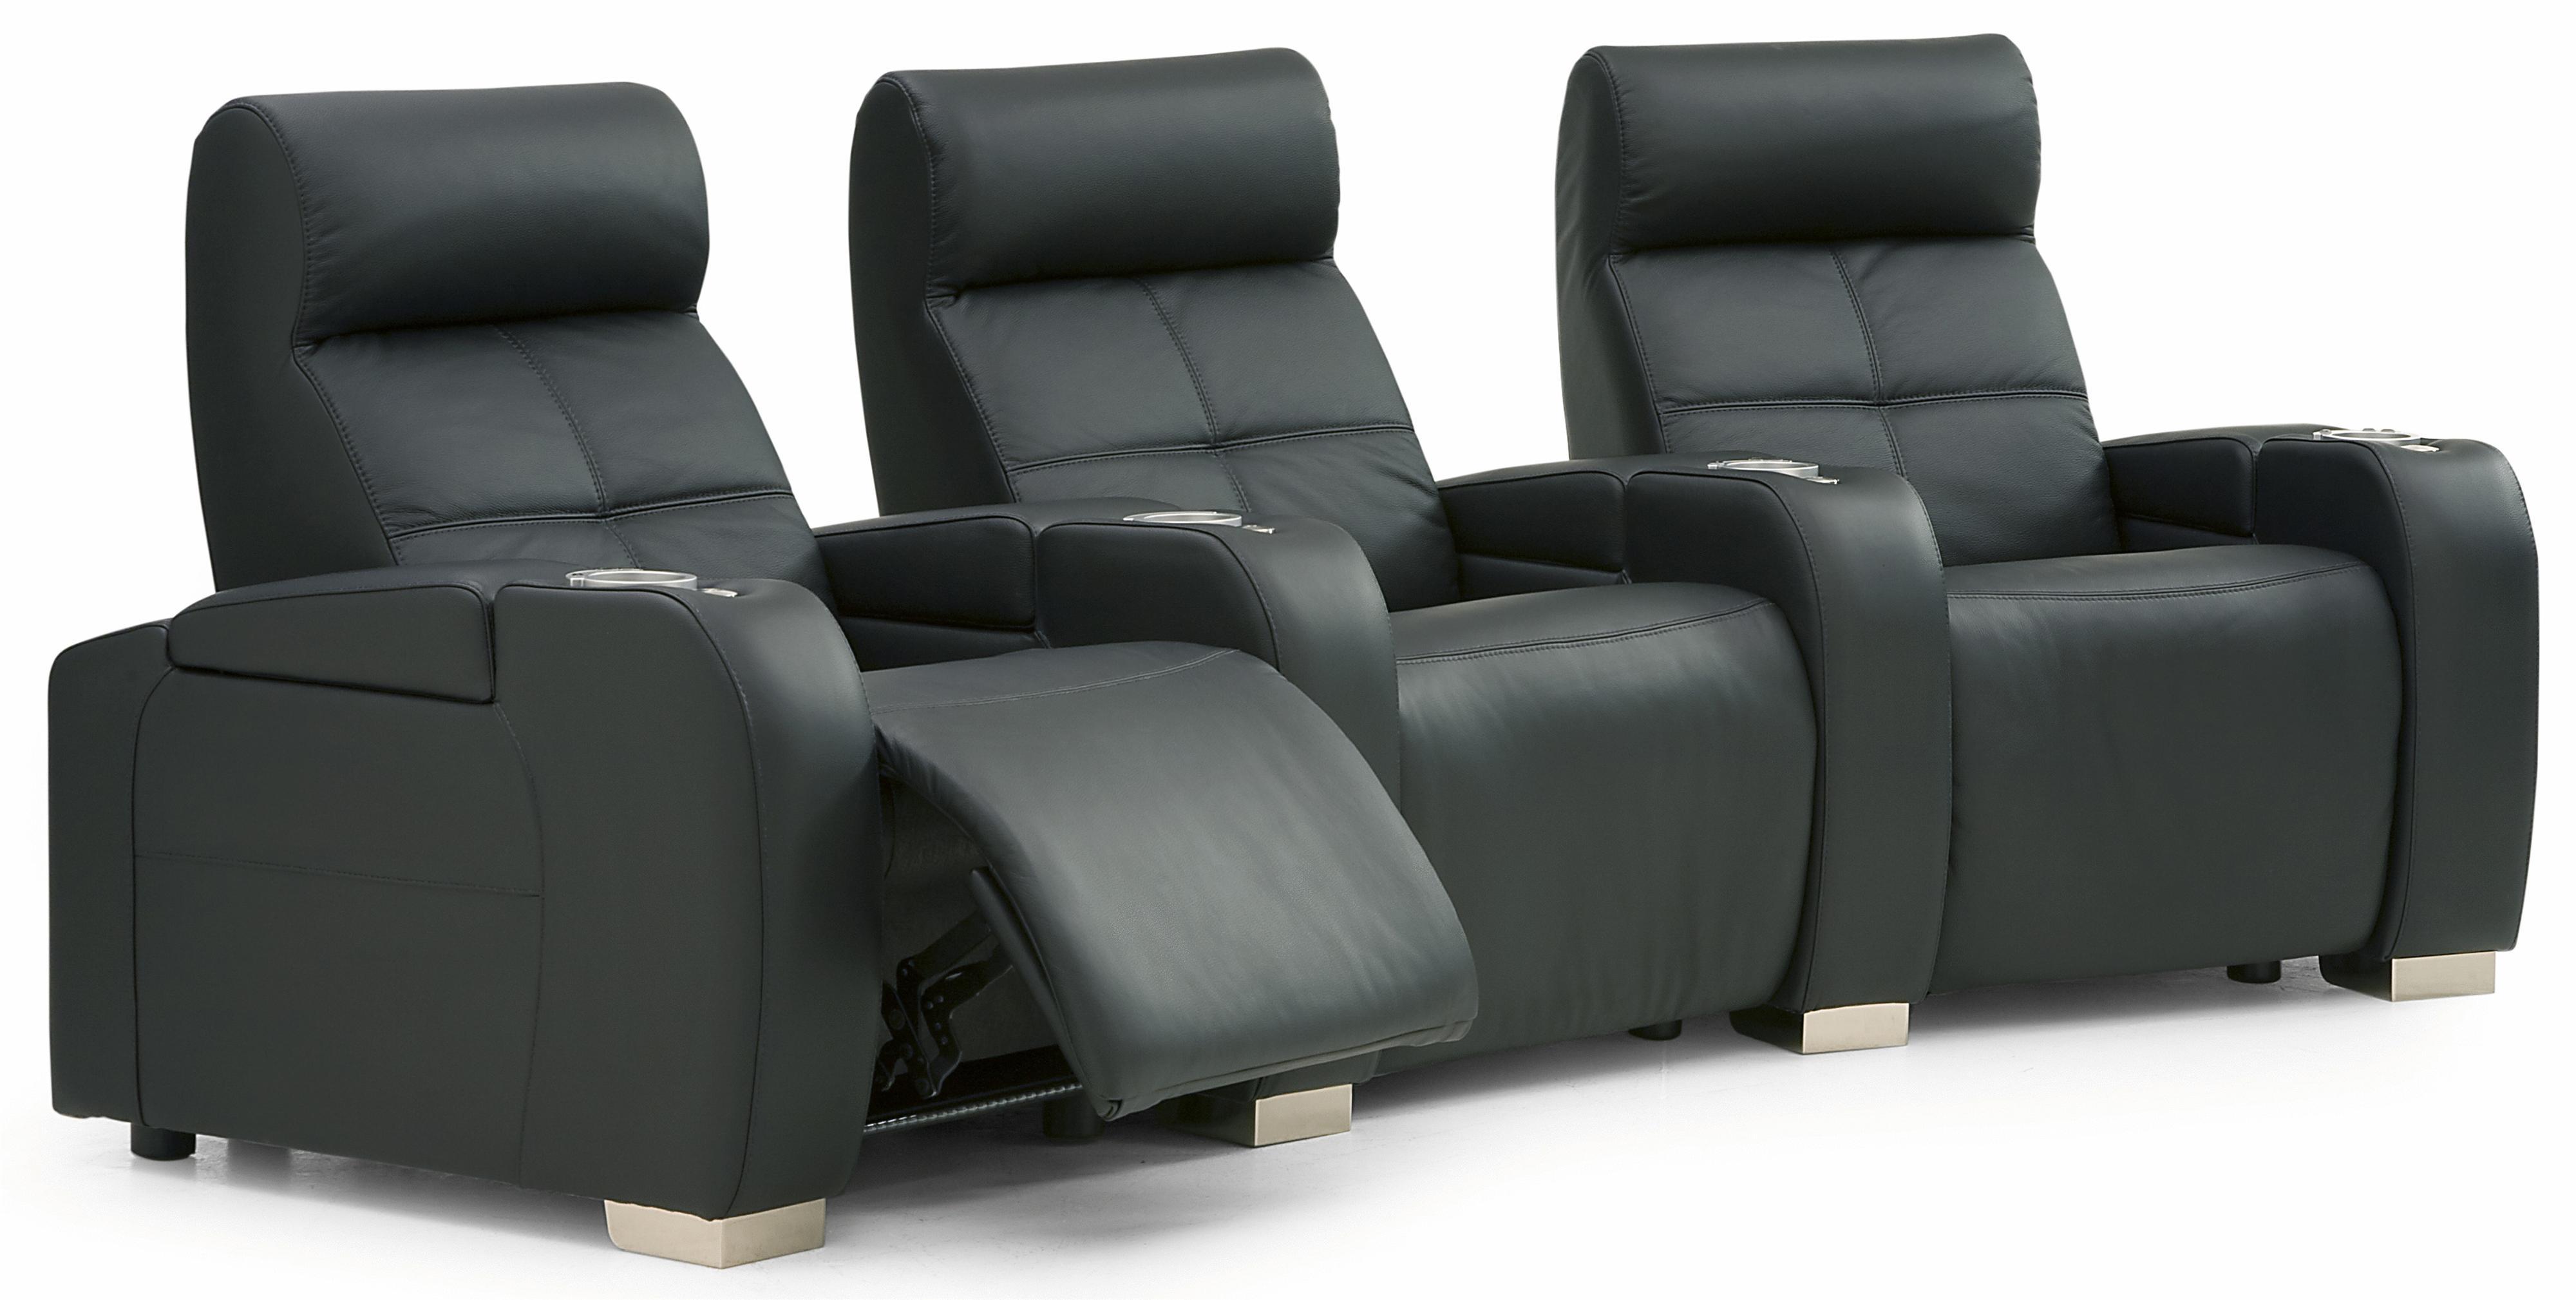 sofa mart indianapolis asian sofas uk palliser contemporary 3 person power theater